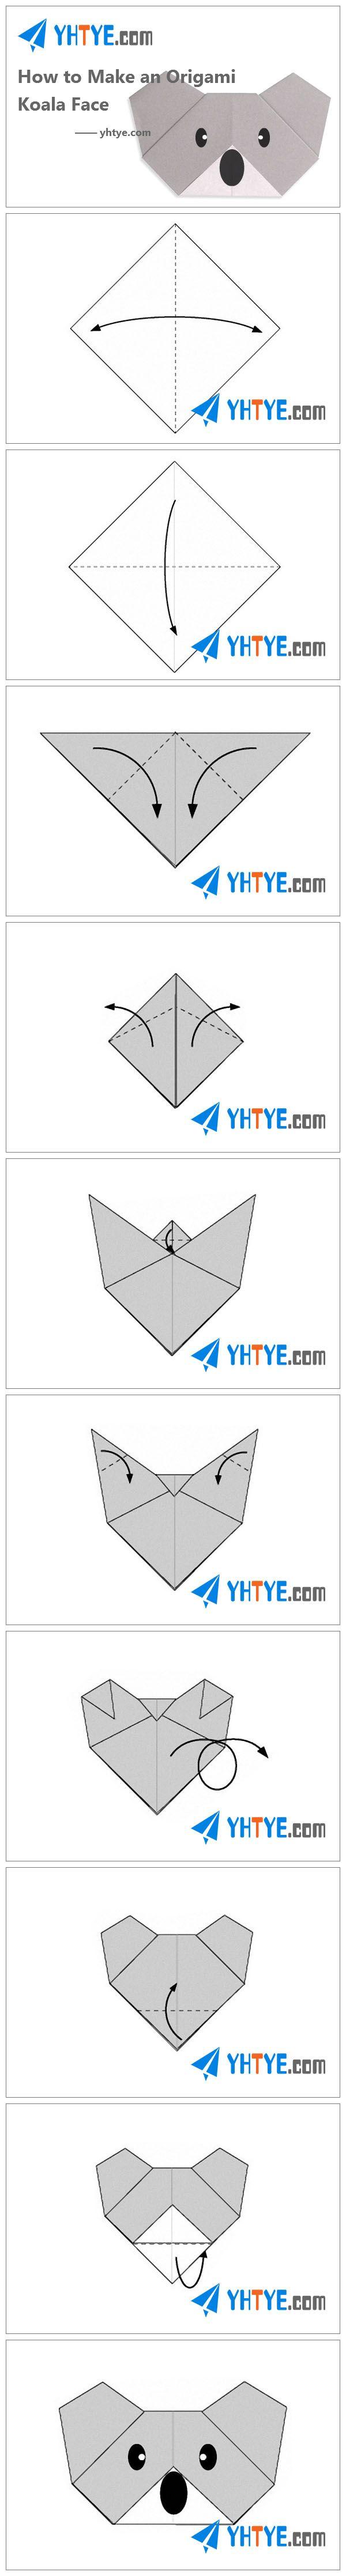 How to Make an Origami Koala Face